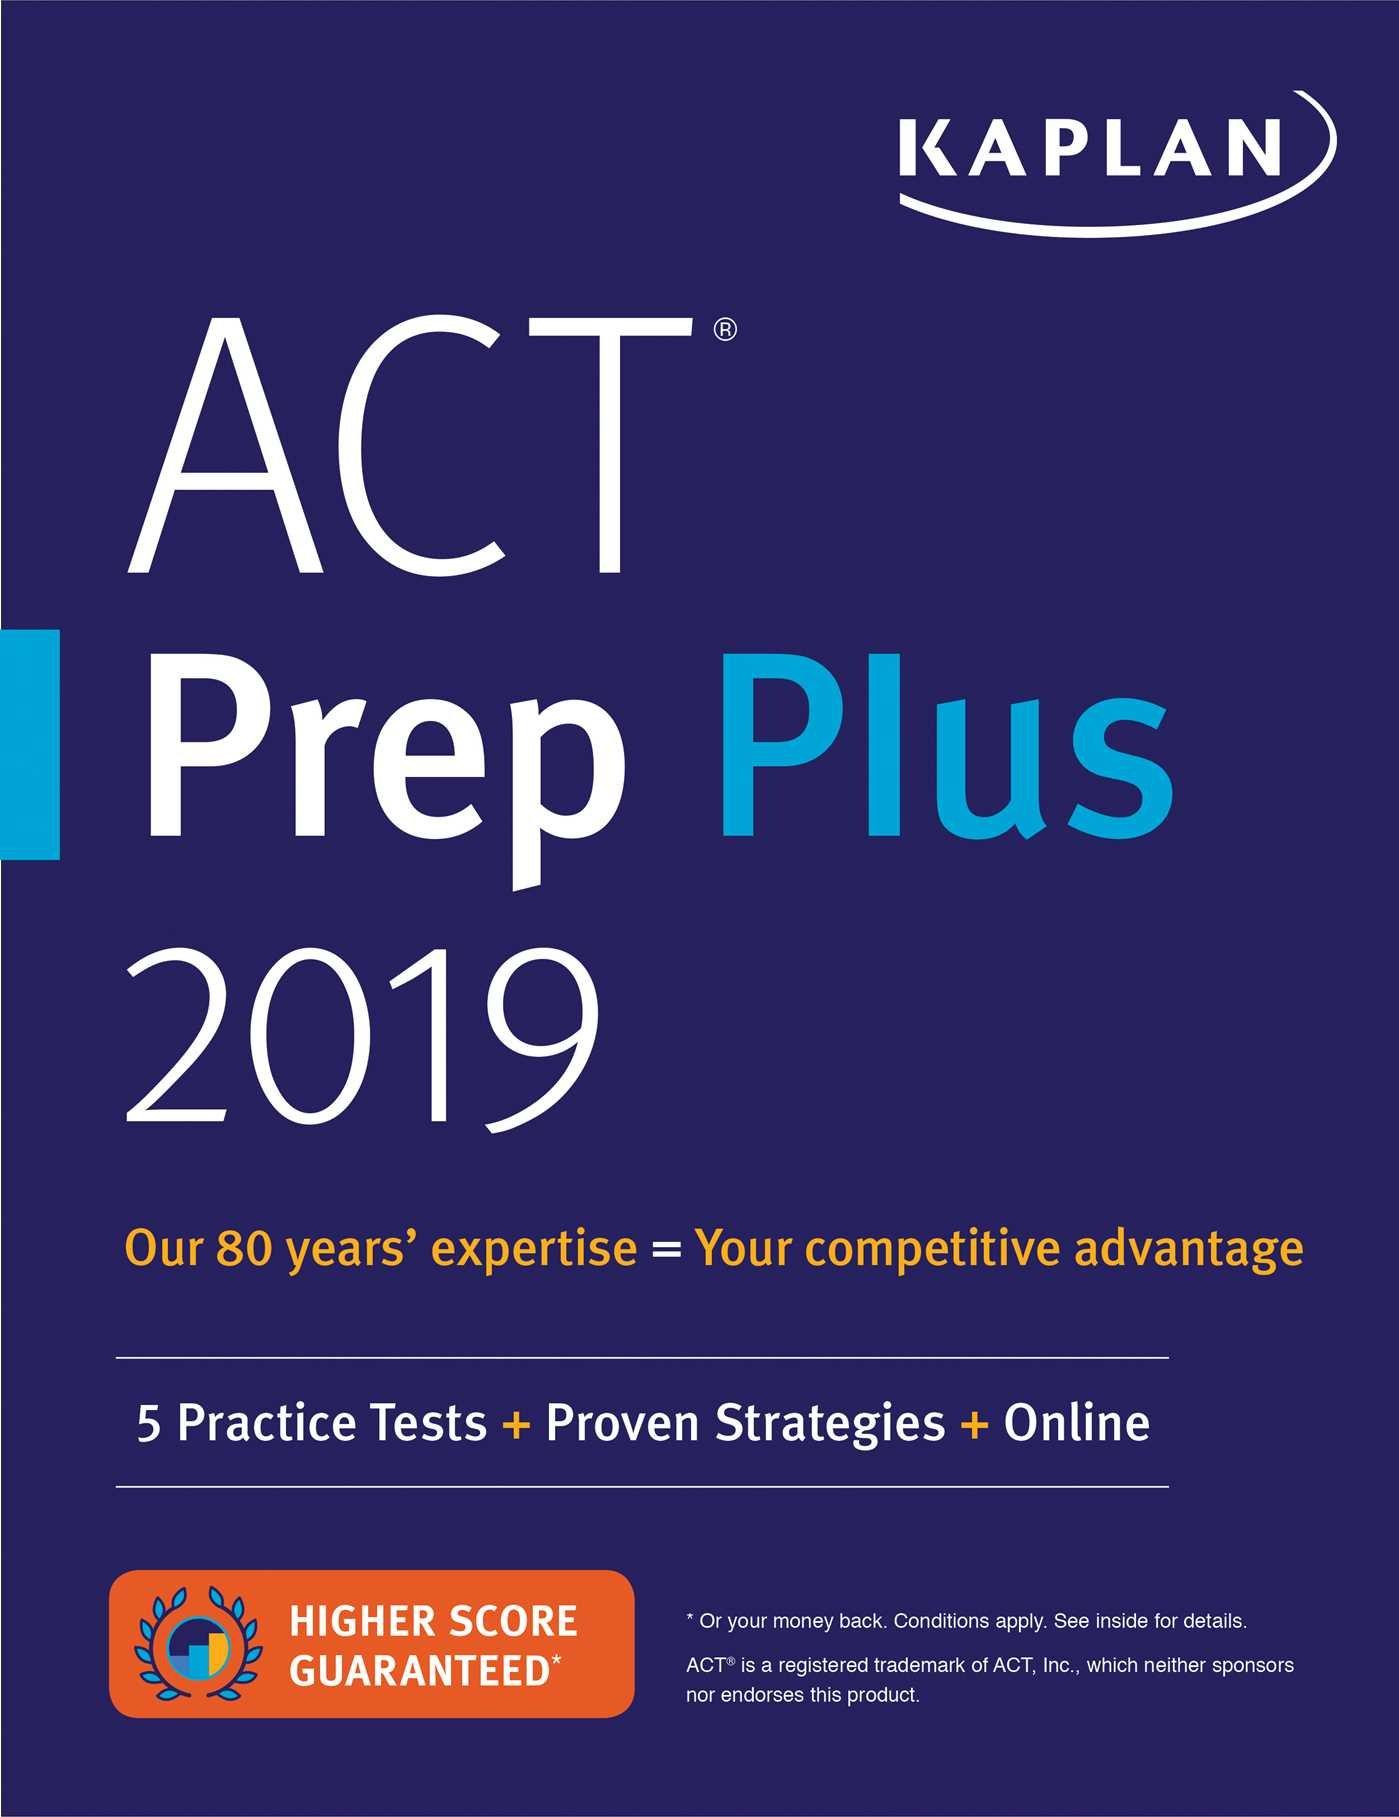 ACT Prep Plus 2019: 5 Practice Tests + Proven Strategies + Online (Kaplan Test Prep)